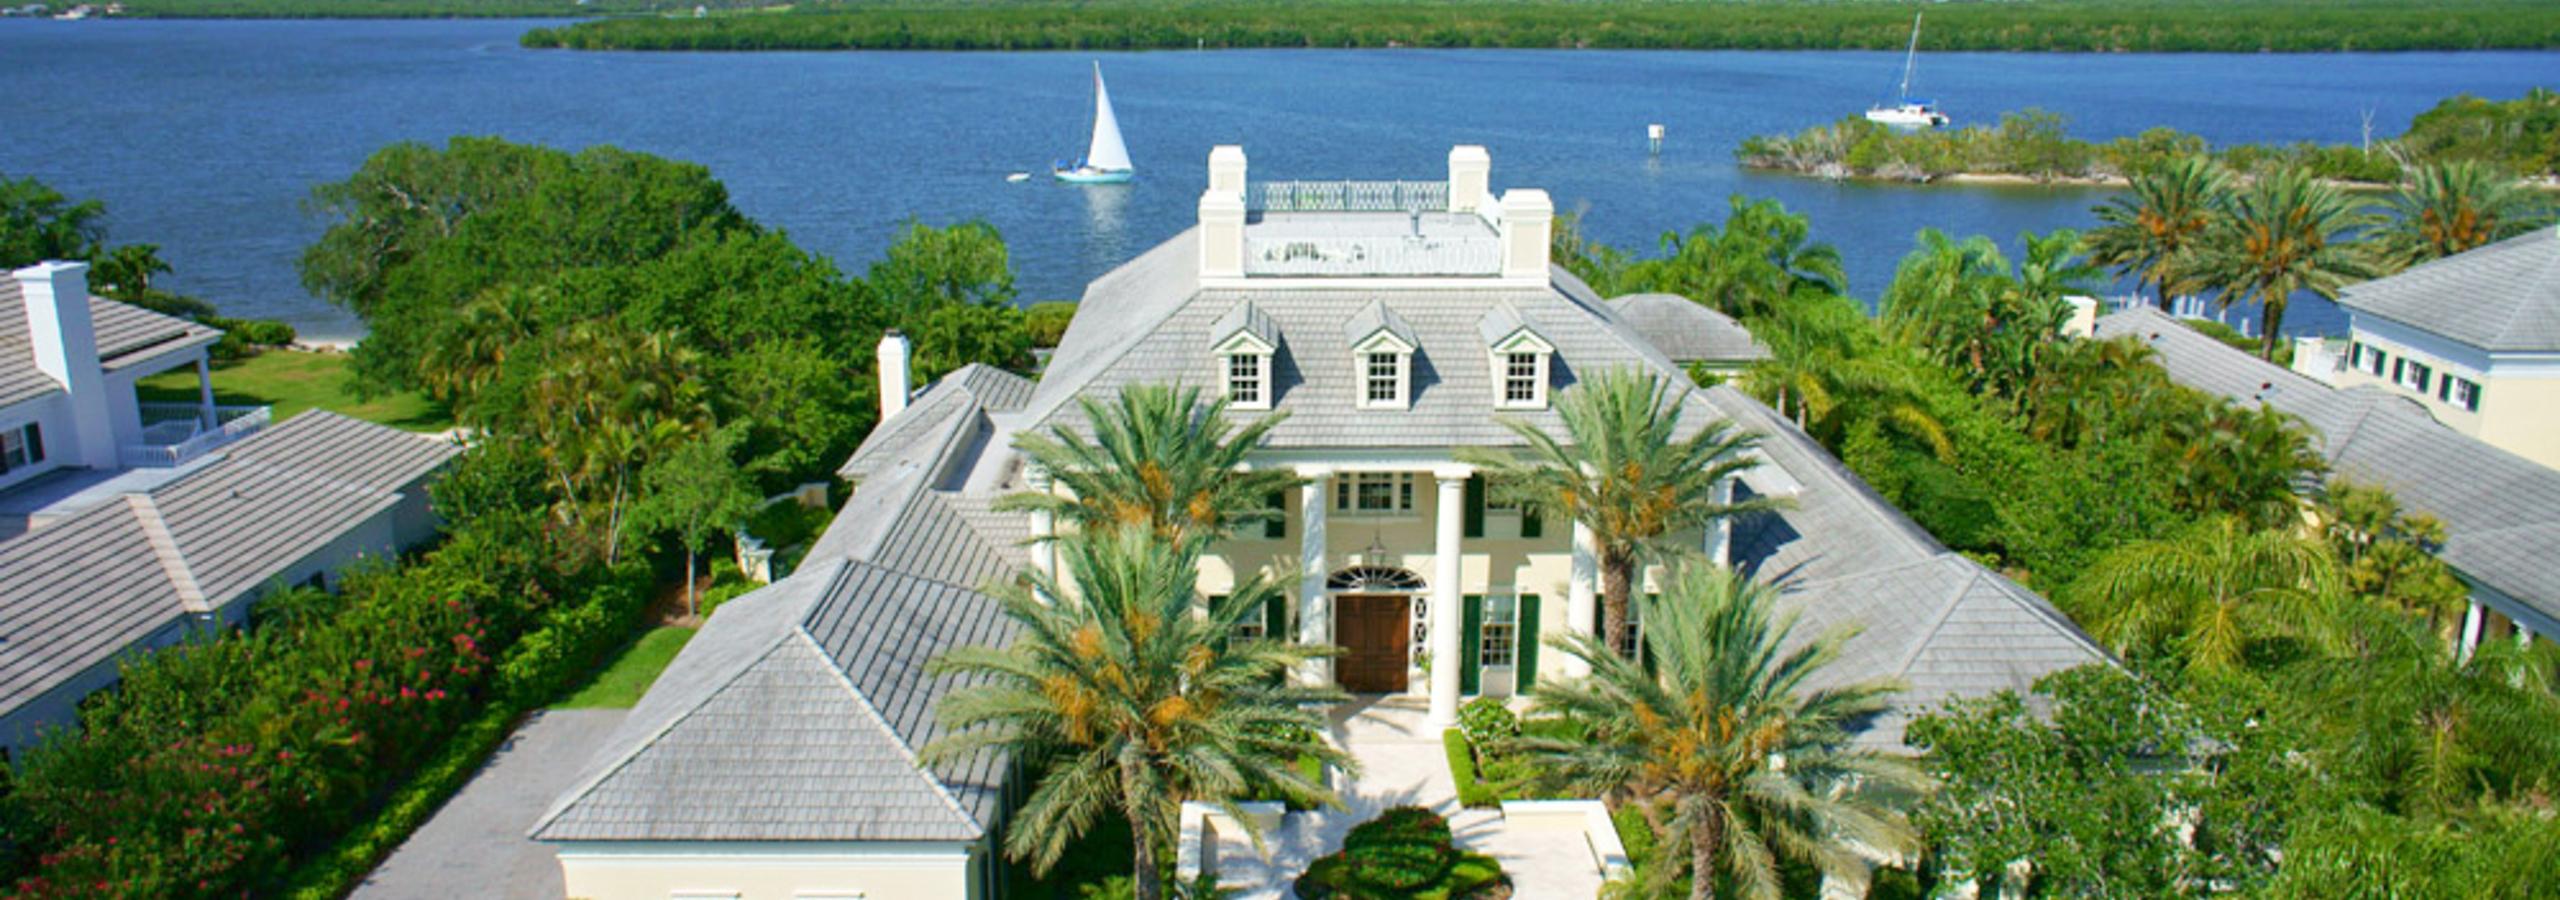 161 Terrapin John's Island Florida Aerial View